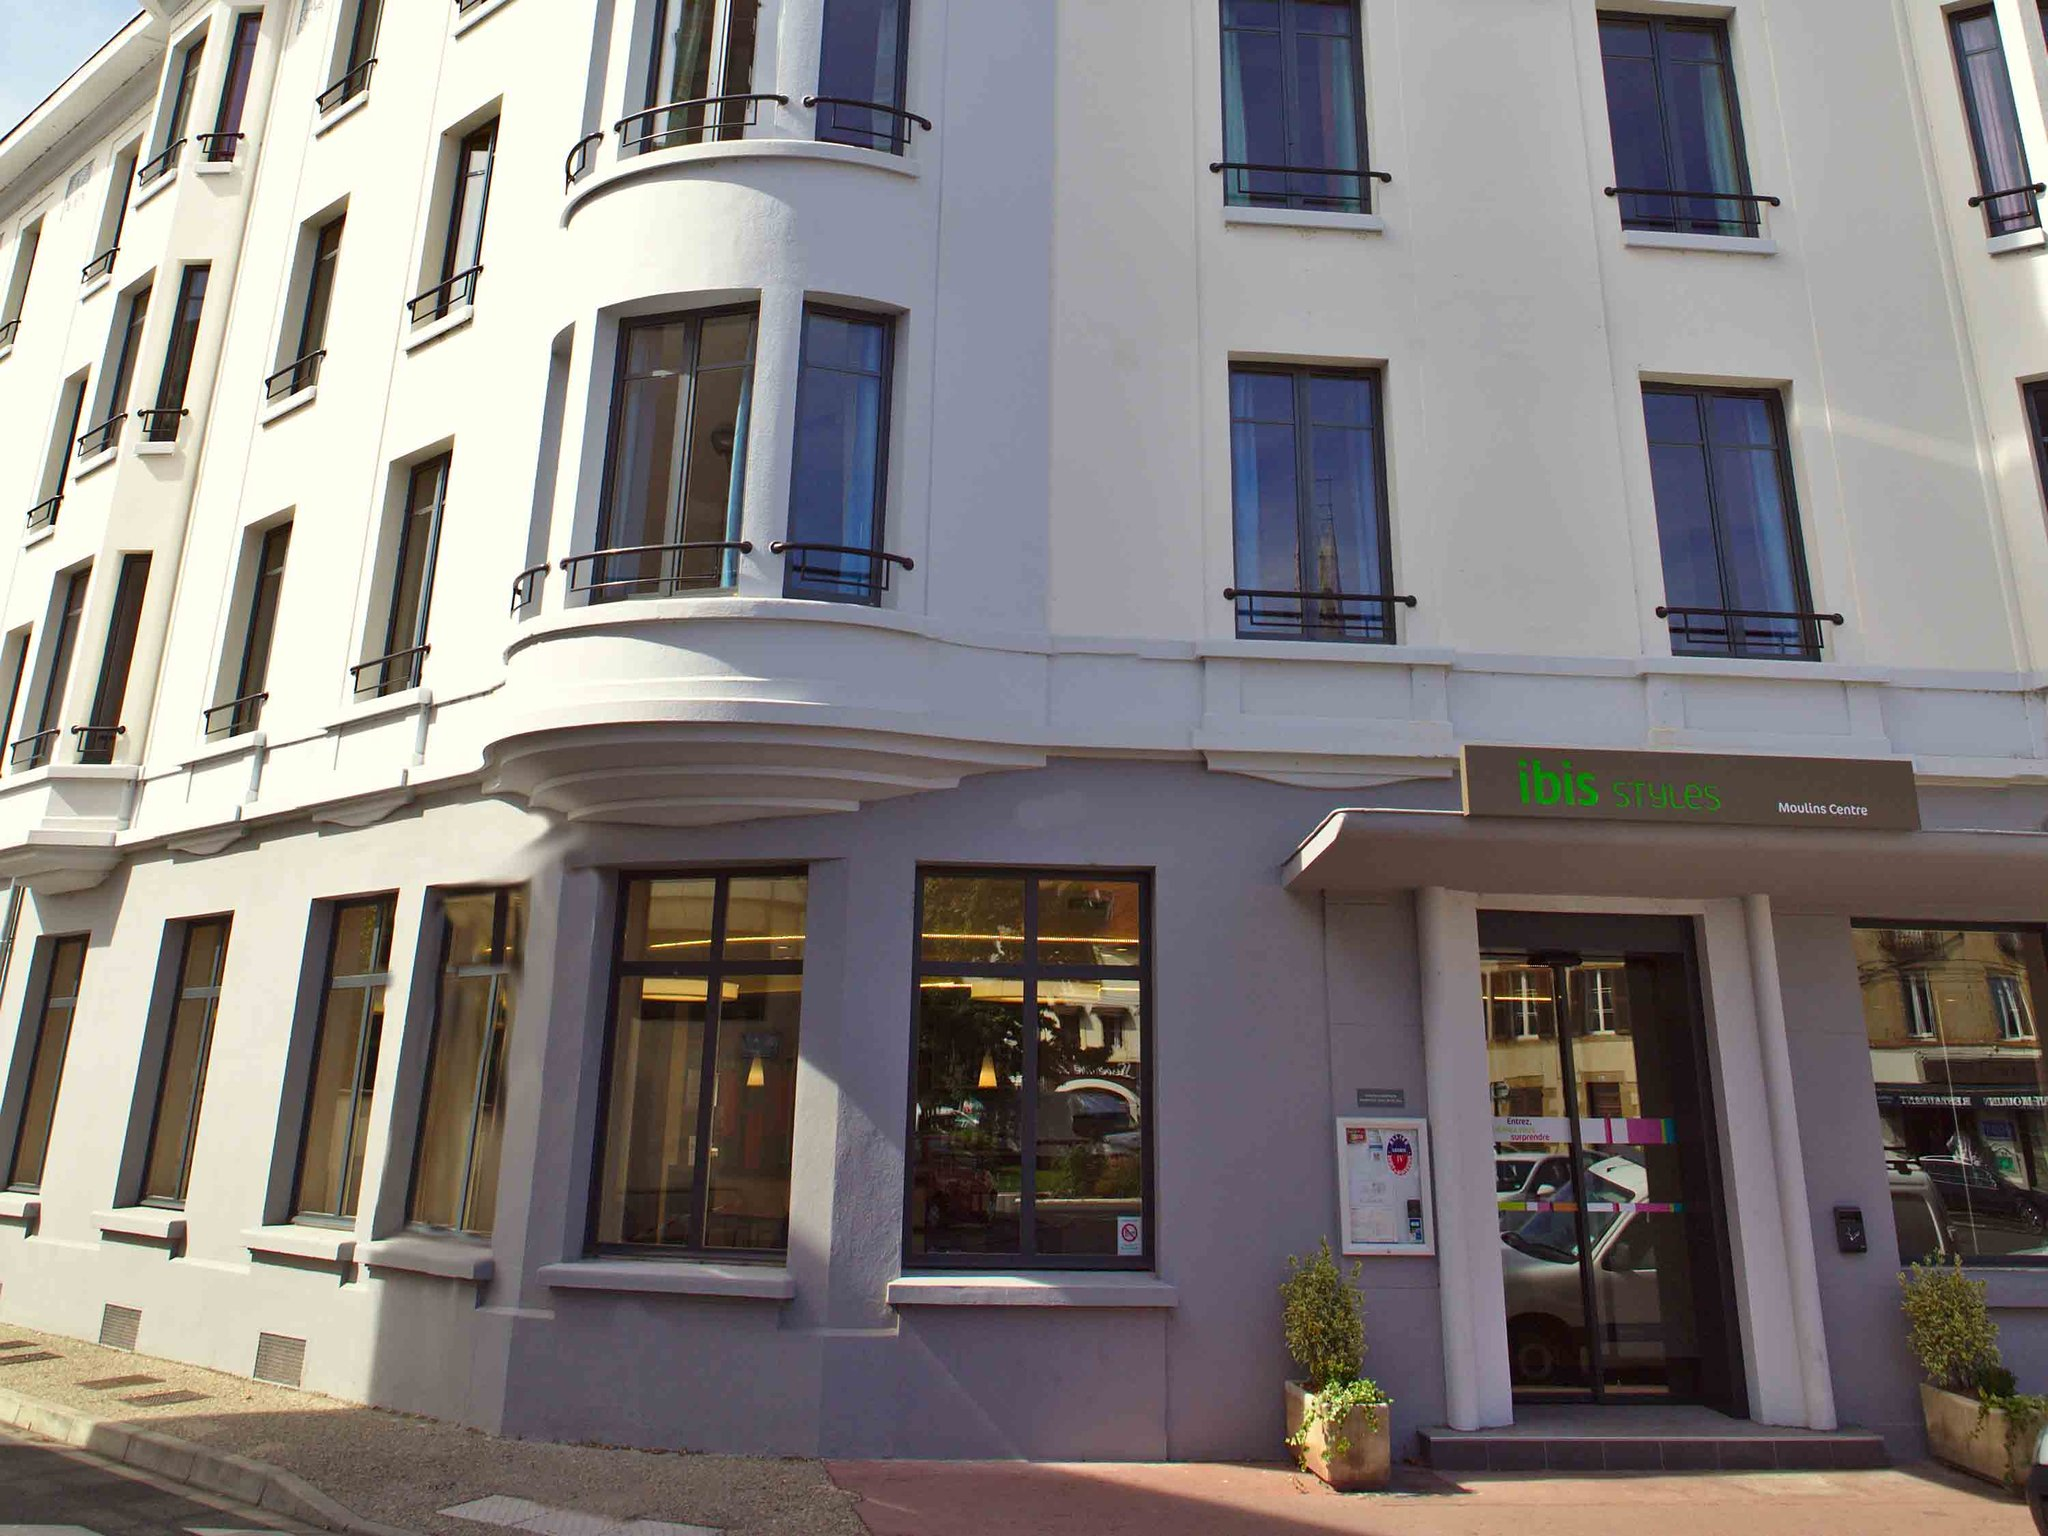 Ibis Styles Moulins-Sur-Allier